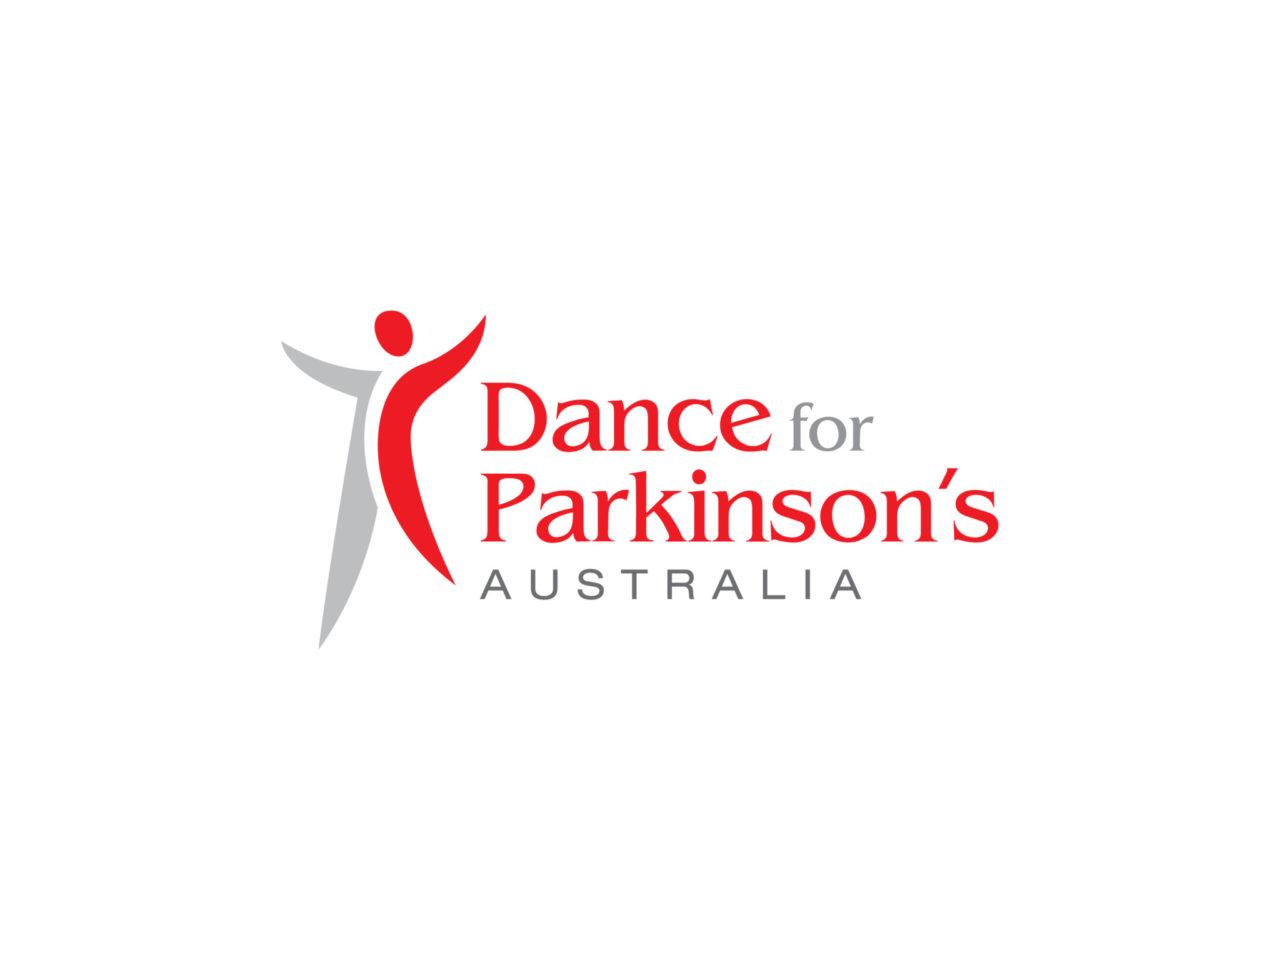 Dance for Parkinson's Australia